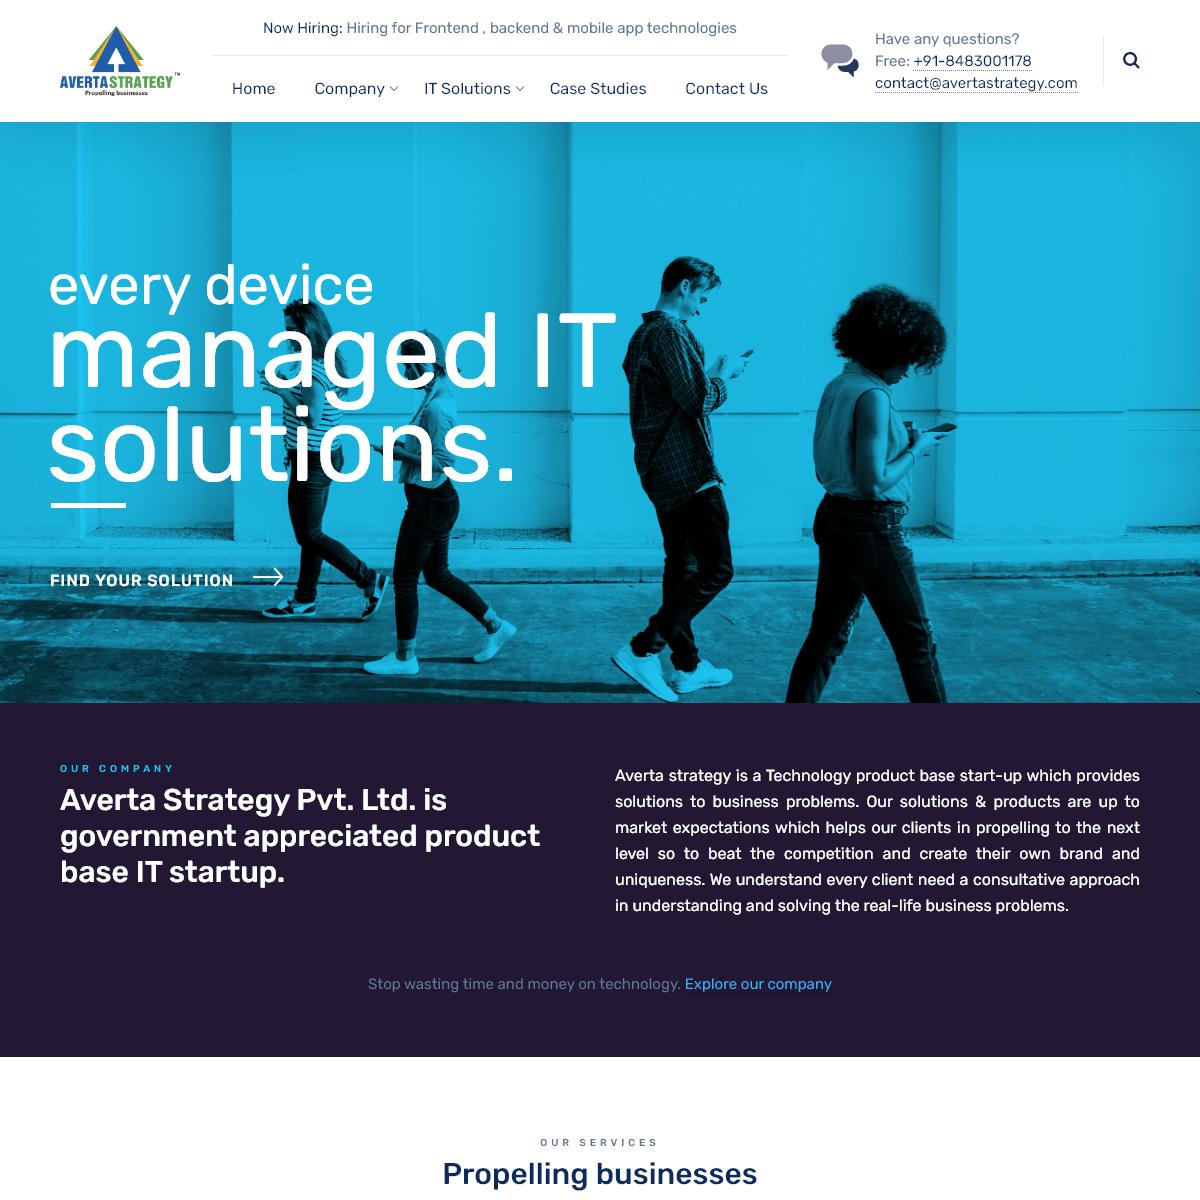 Home - Averta Strategy Pvt. Ltd.